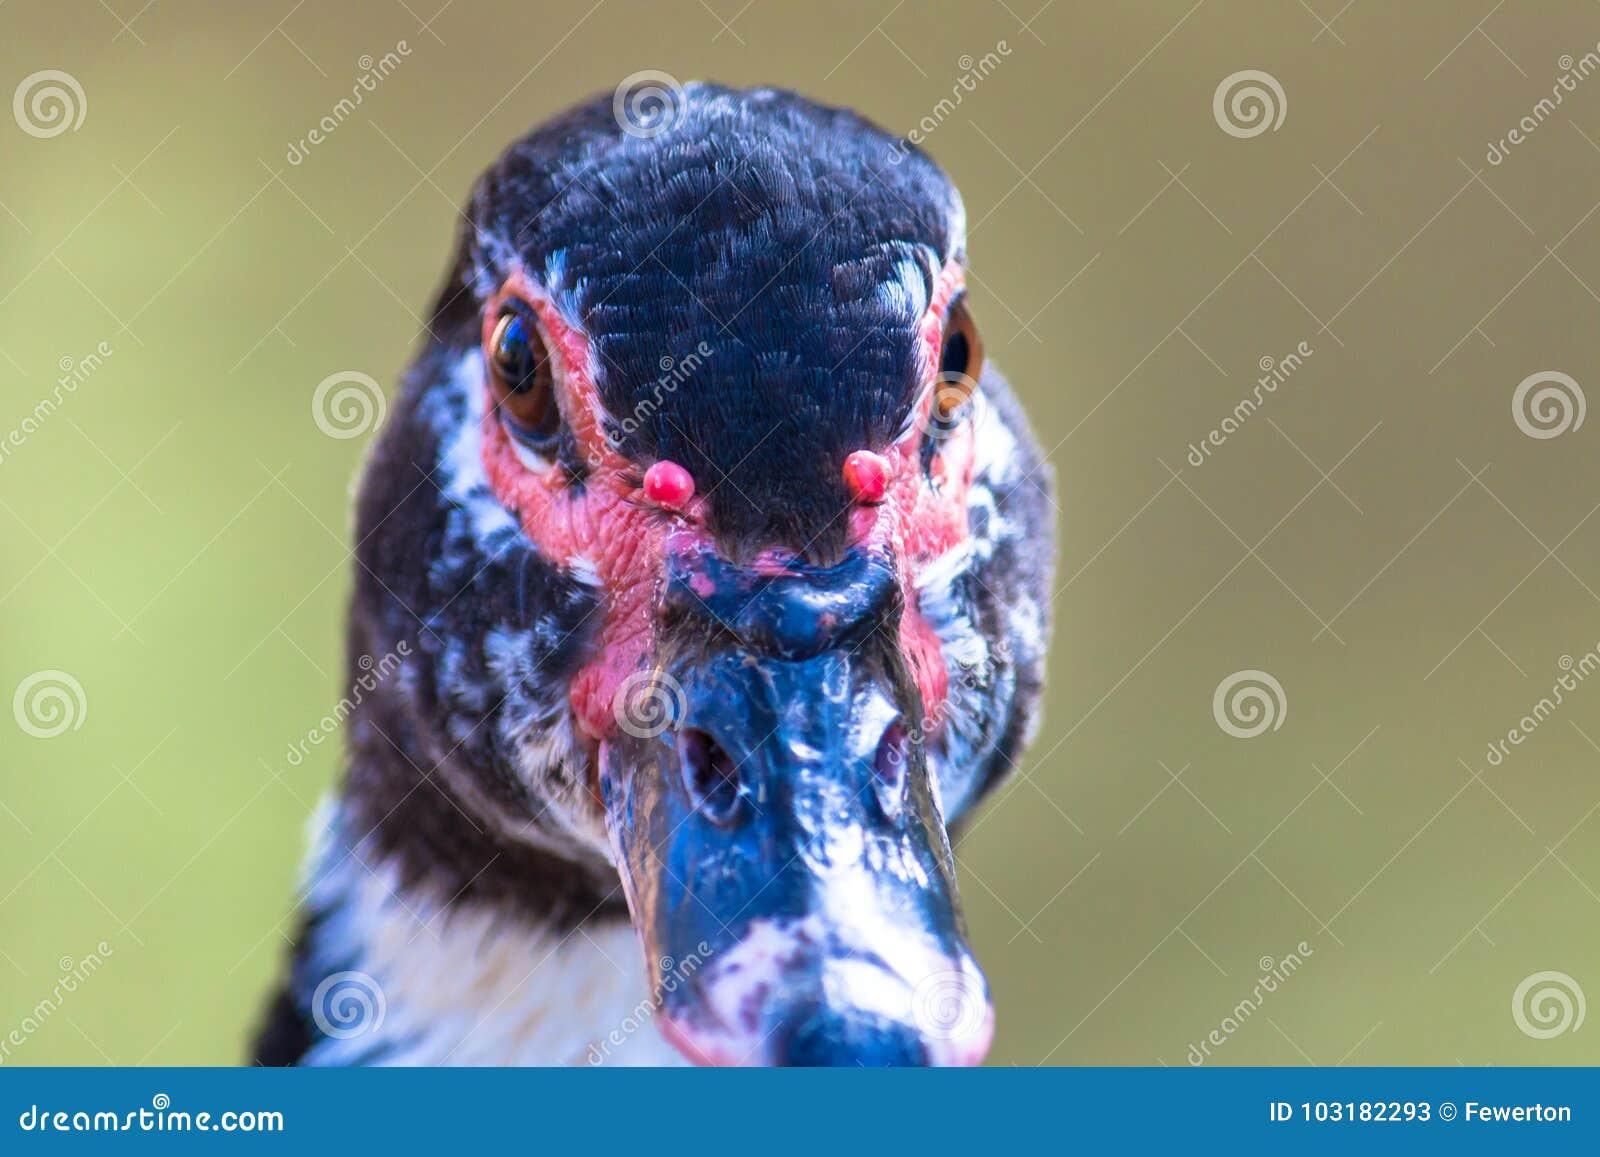 Fin de moschata de Cairina de canard de Muscovy vers le haut du portrait frontal principal